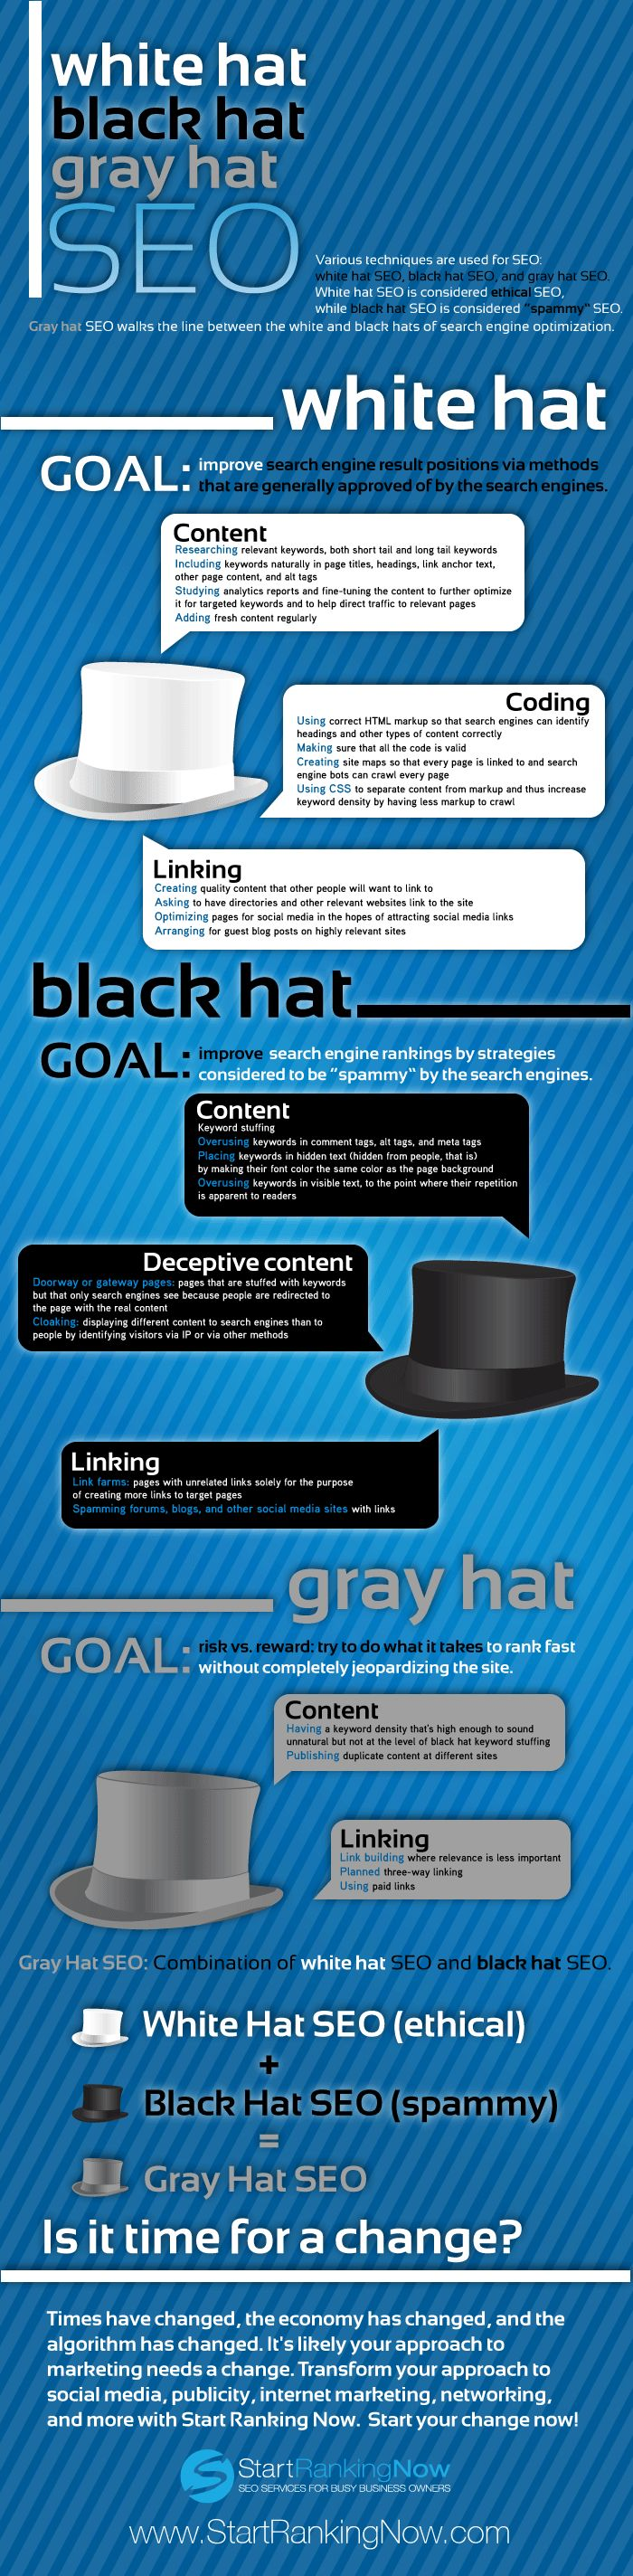 White Black or Gray Hat Seo - iNFOGRAPHiCsMANiA